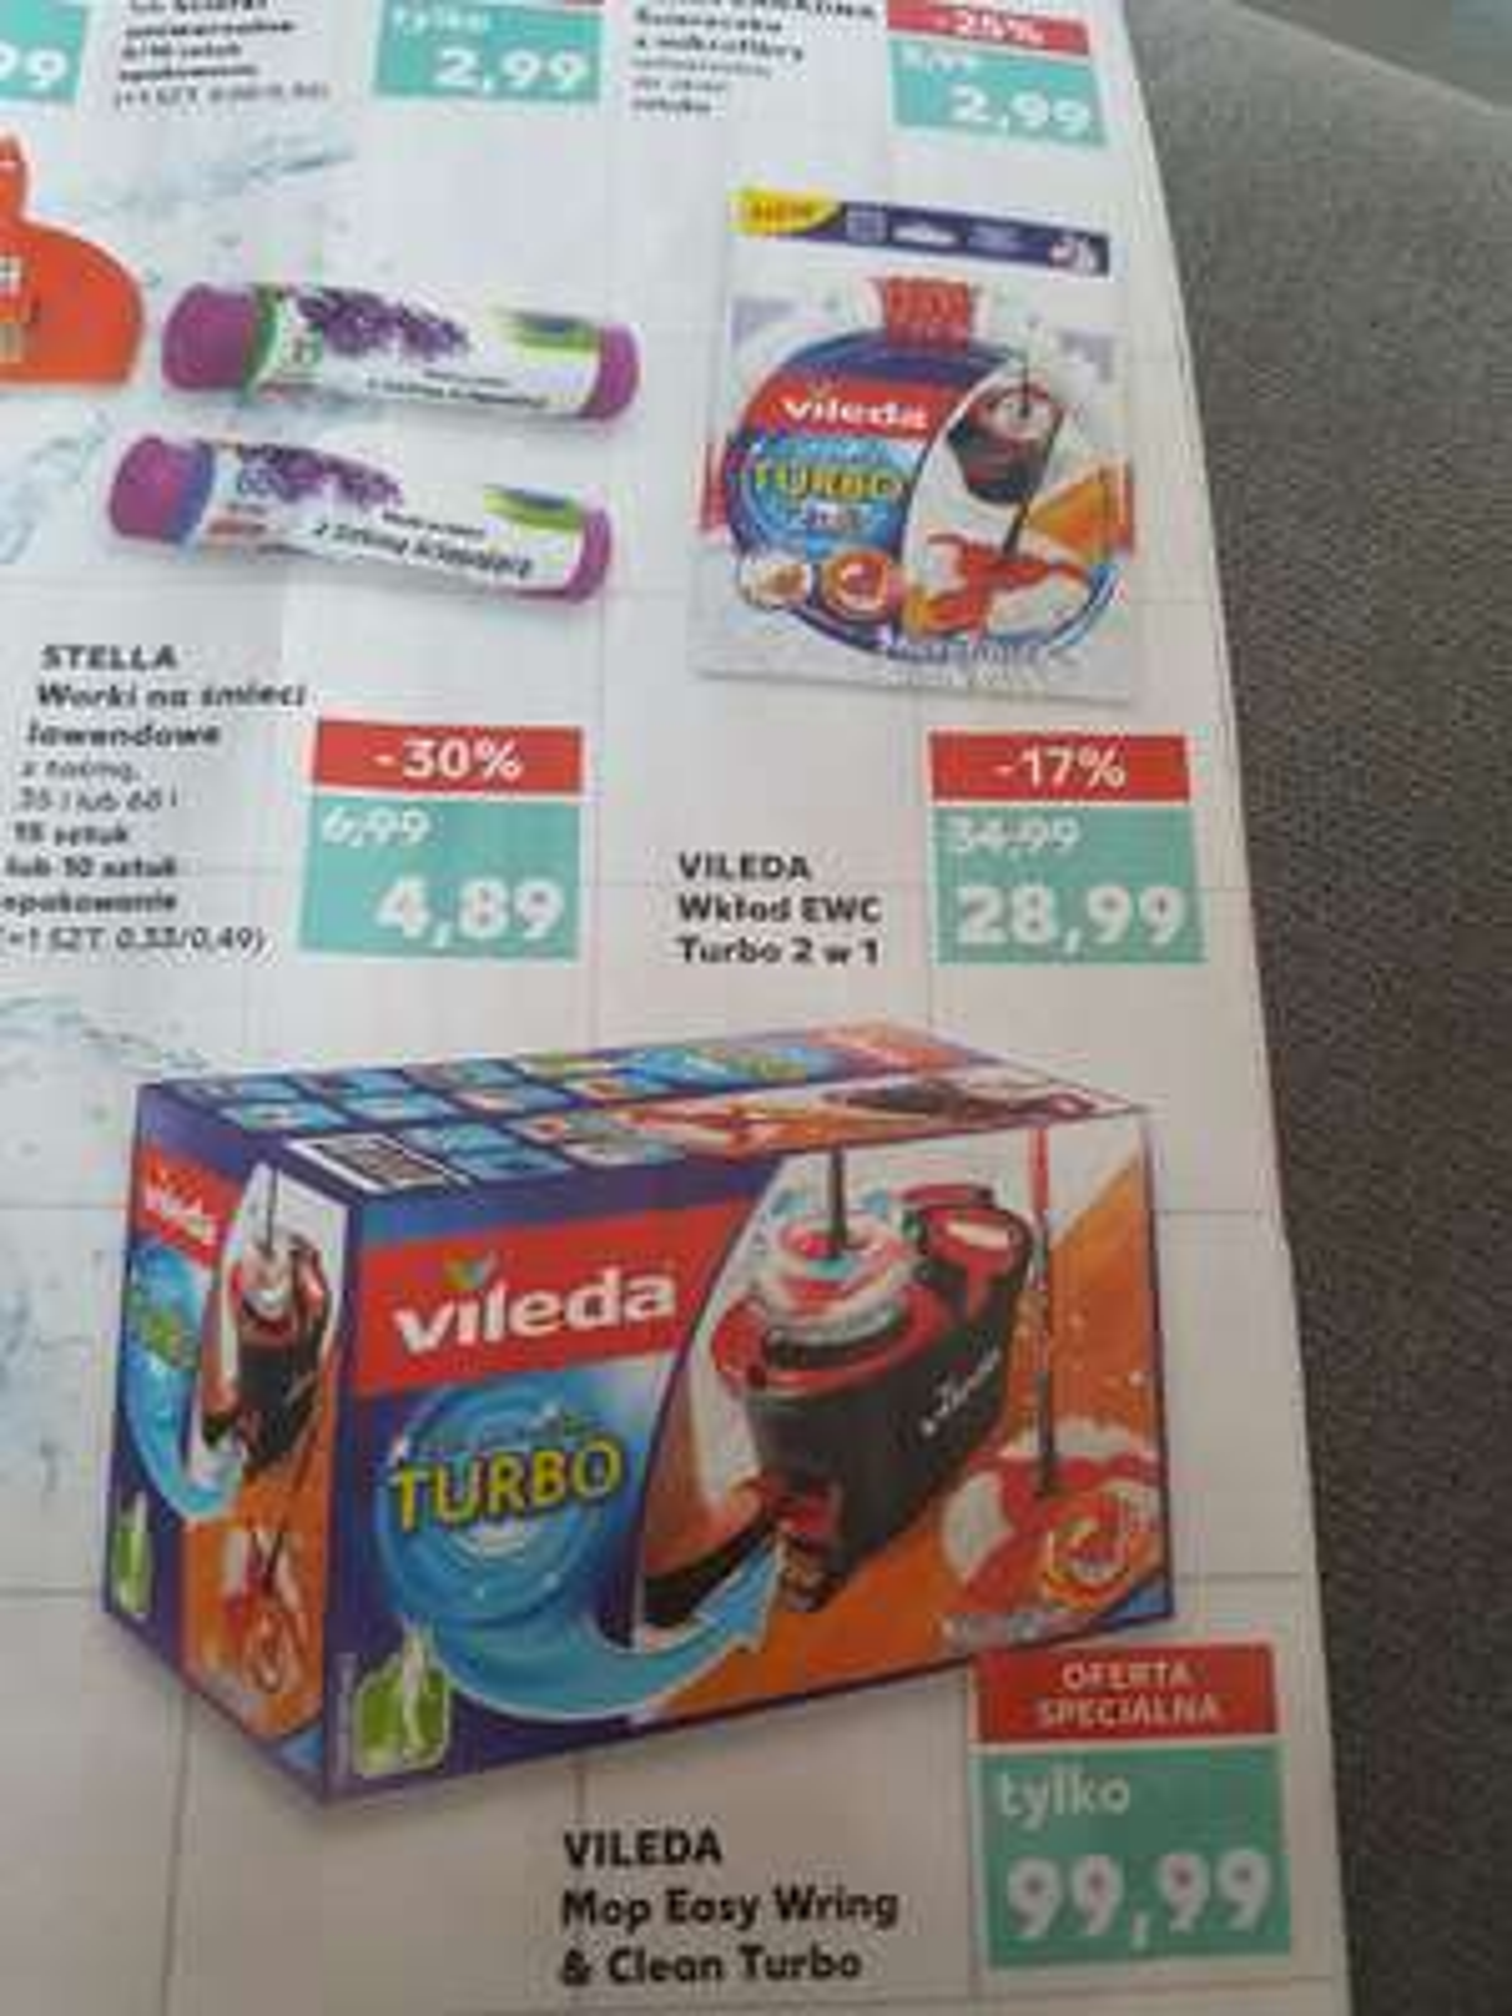 Kaufland Vileda Mop Easy Wrign & Clean Turbo 99.99zl oraz Vileda Ultramax 79.99zl